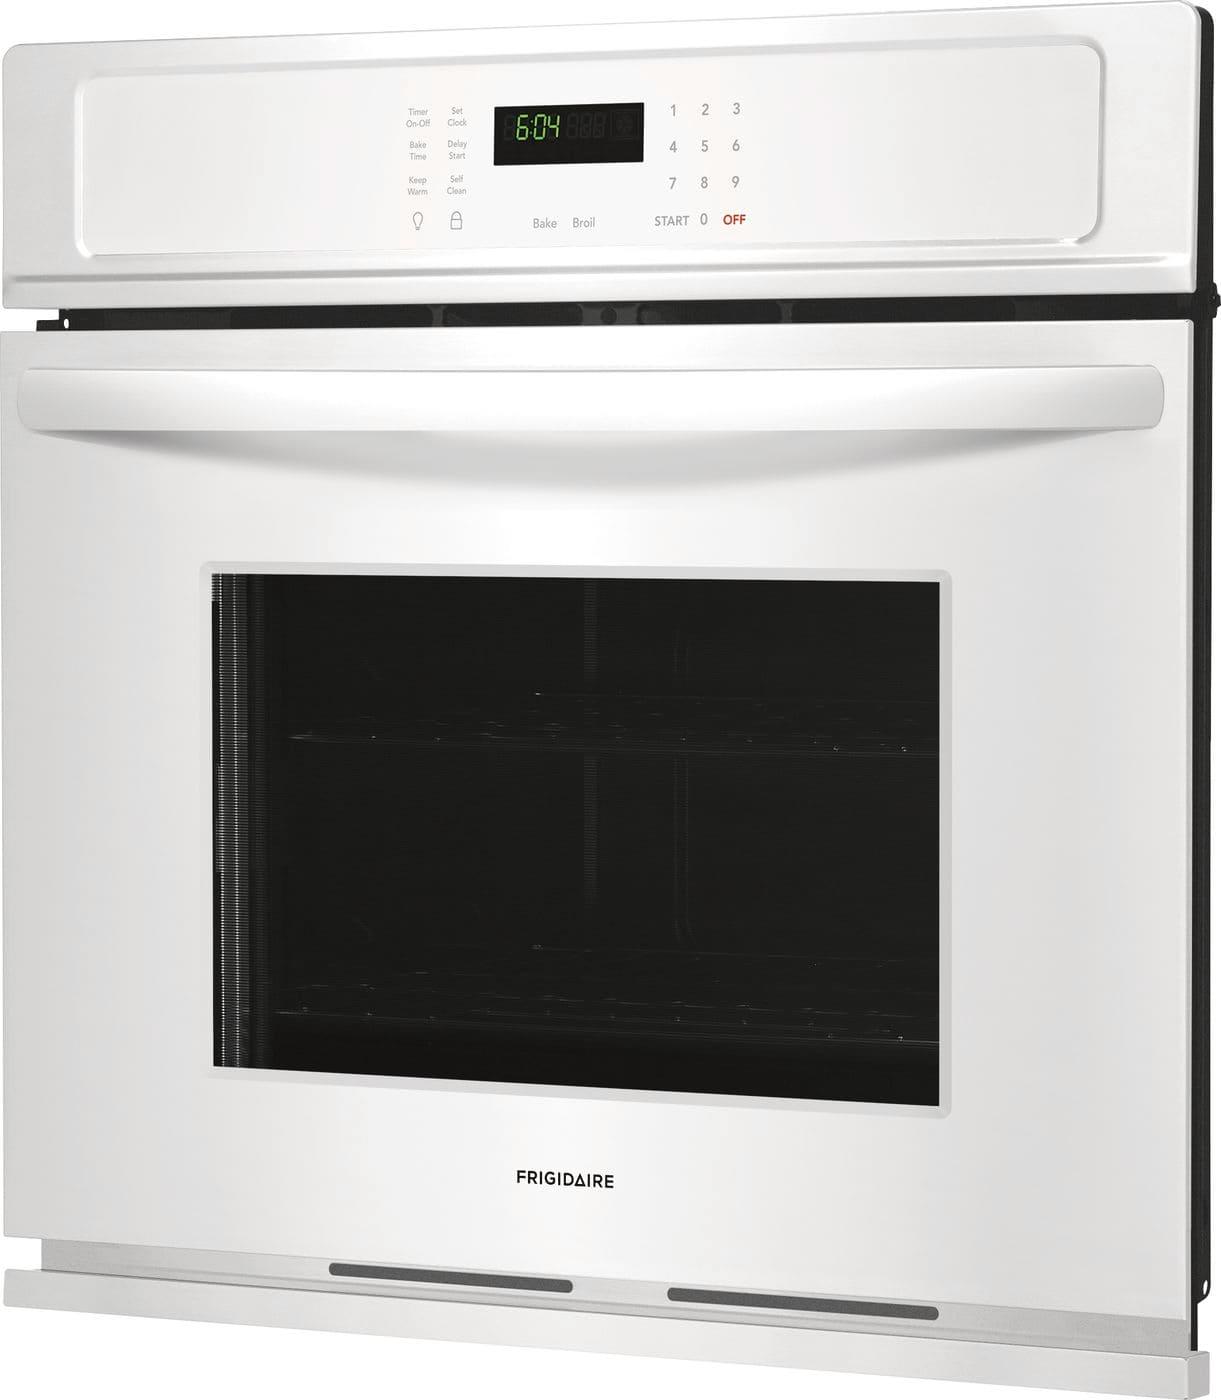 "Model: FFEW3026TW   Frigidaire 30"" Single Electric Wall Oven"